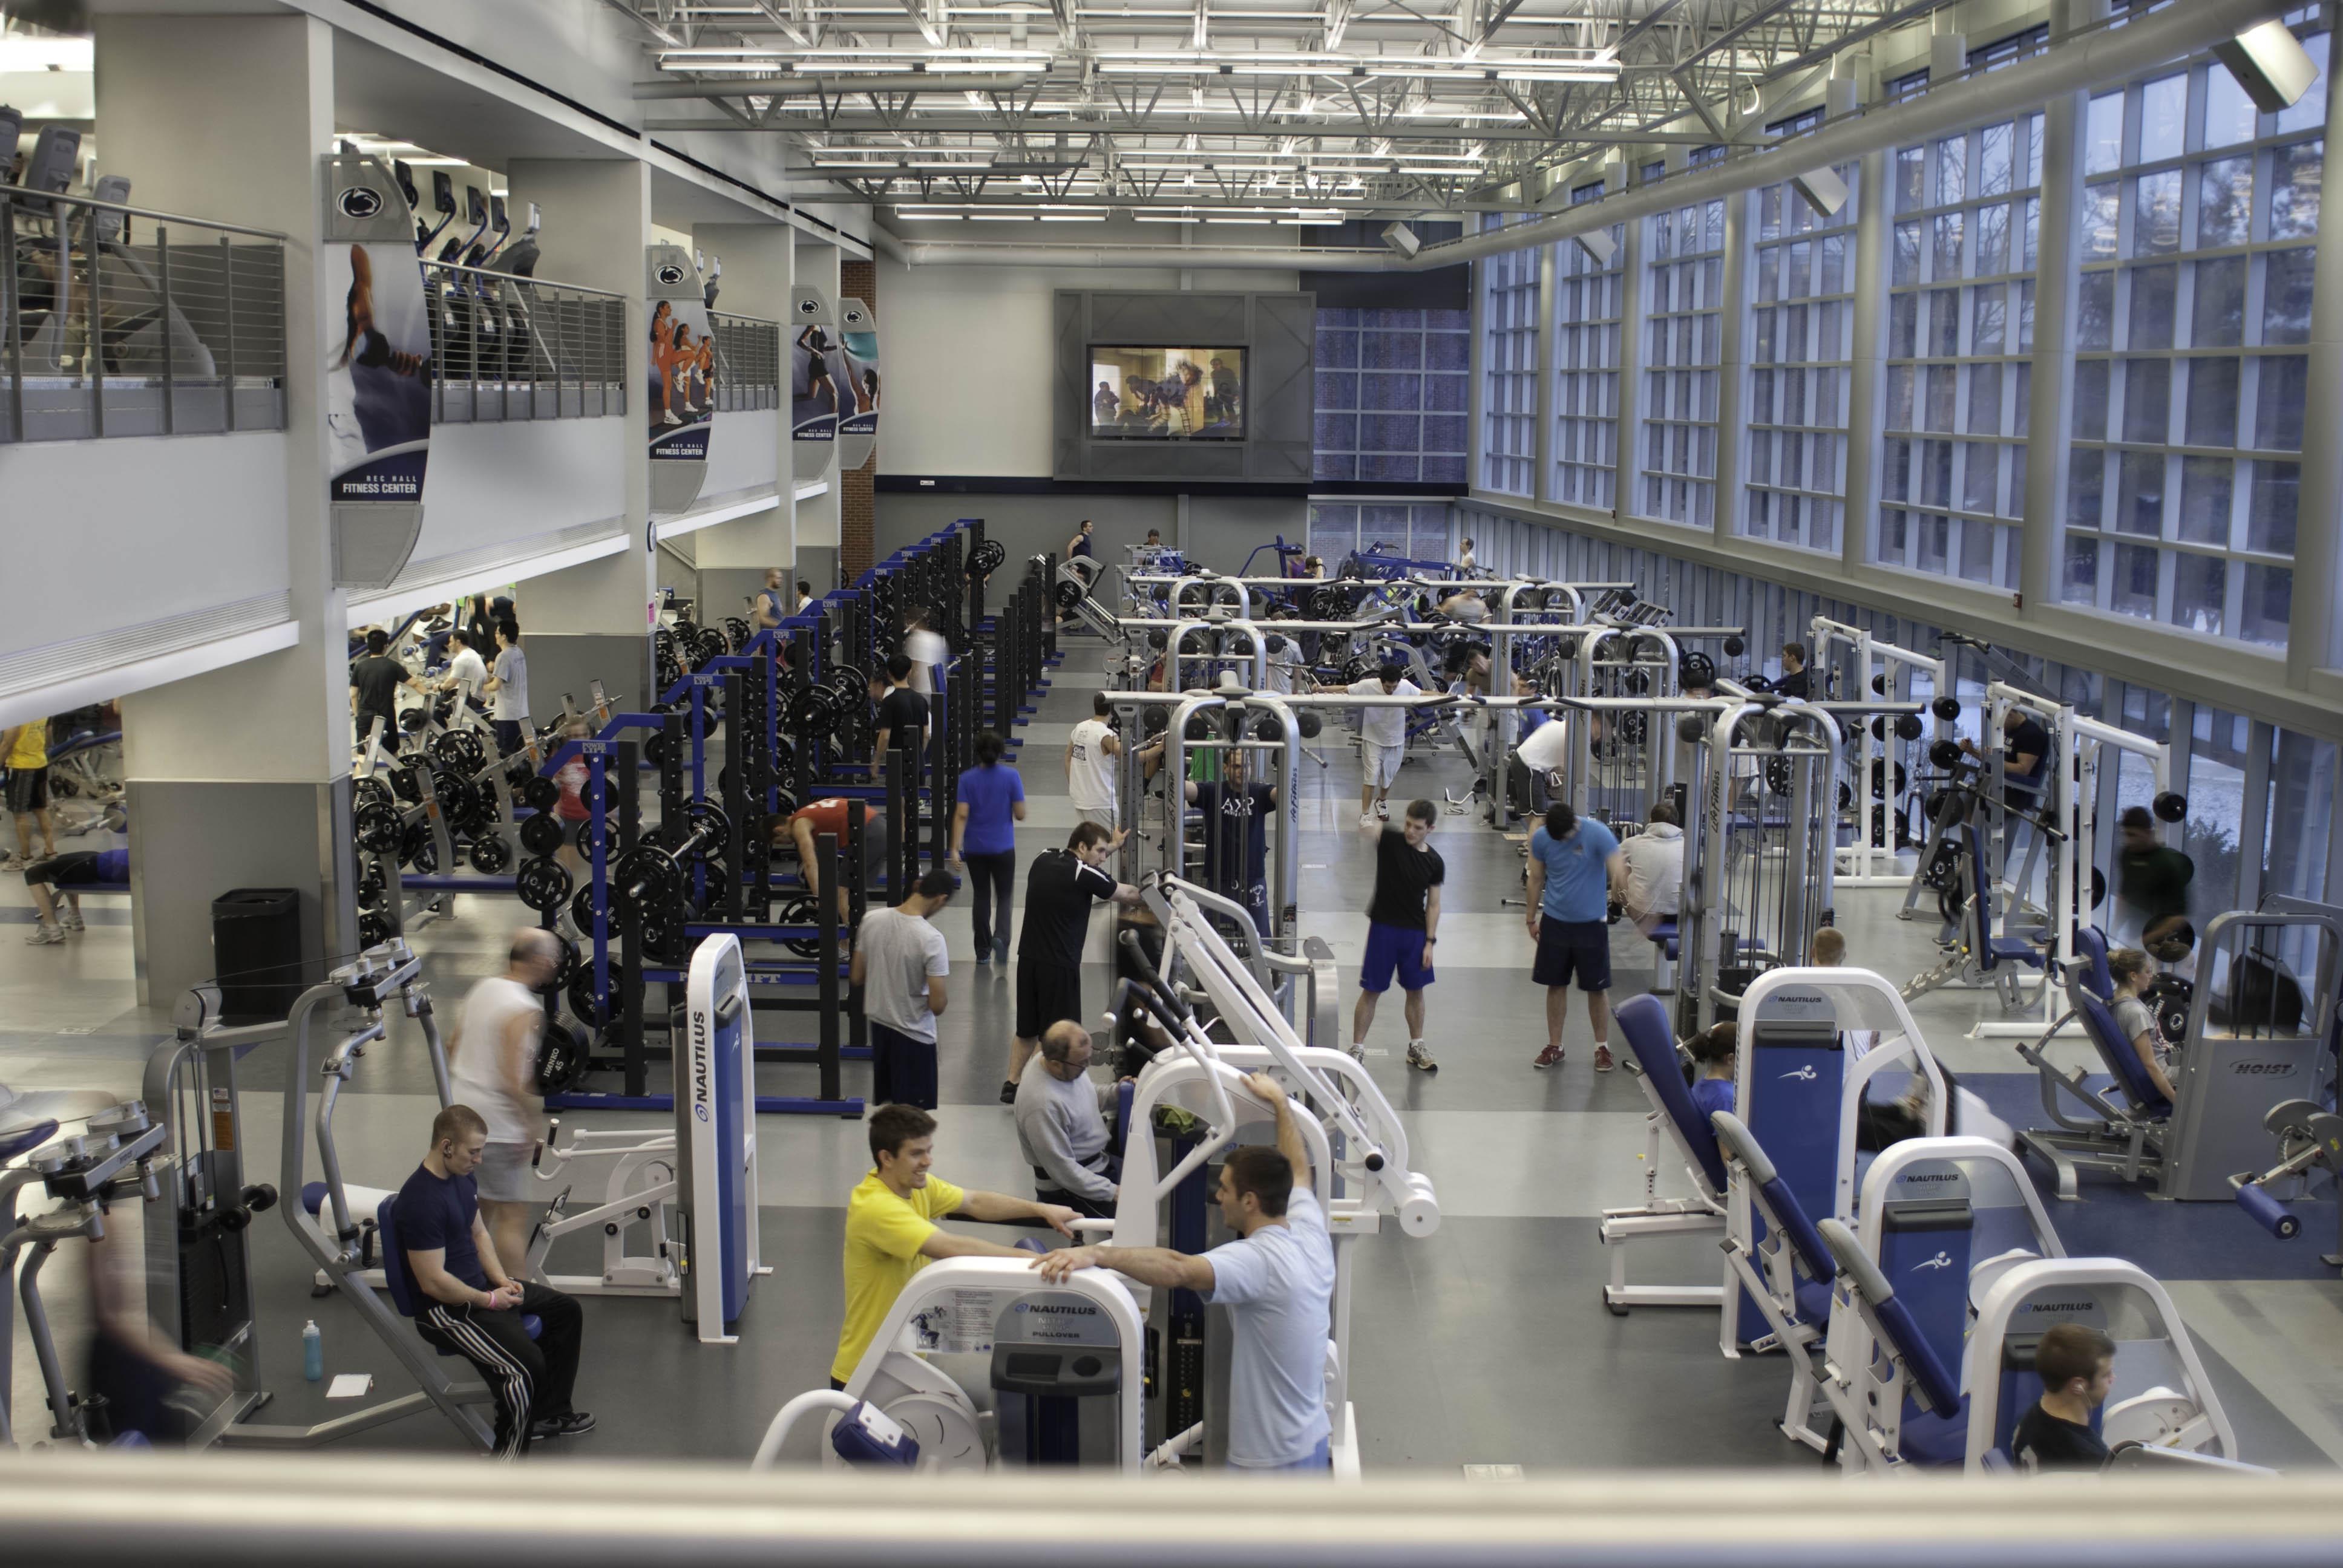 rec-hall-gym1.jpg